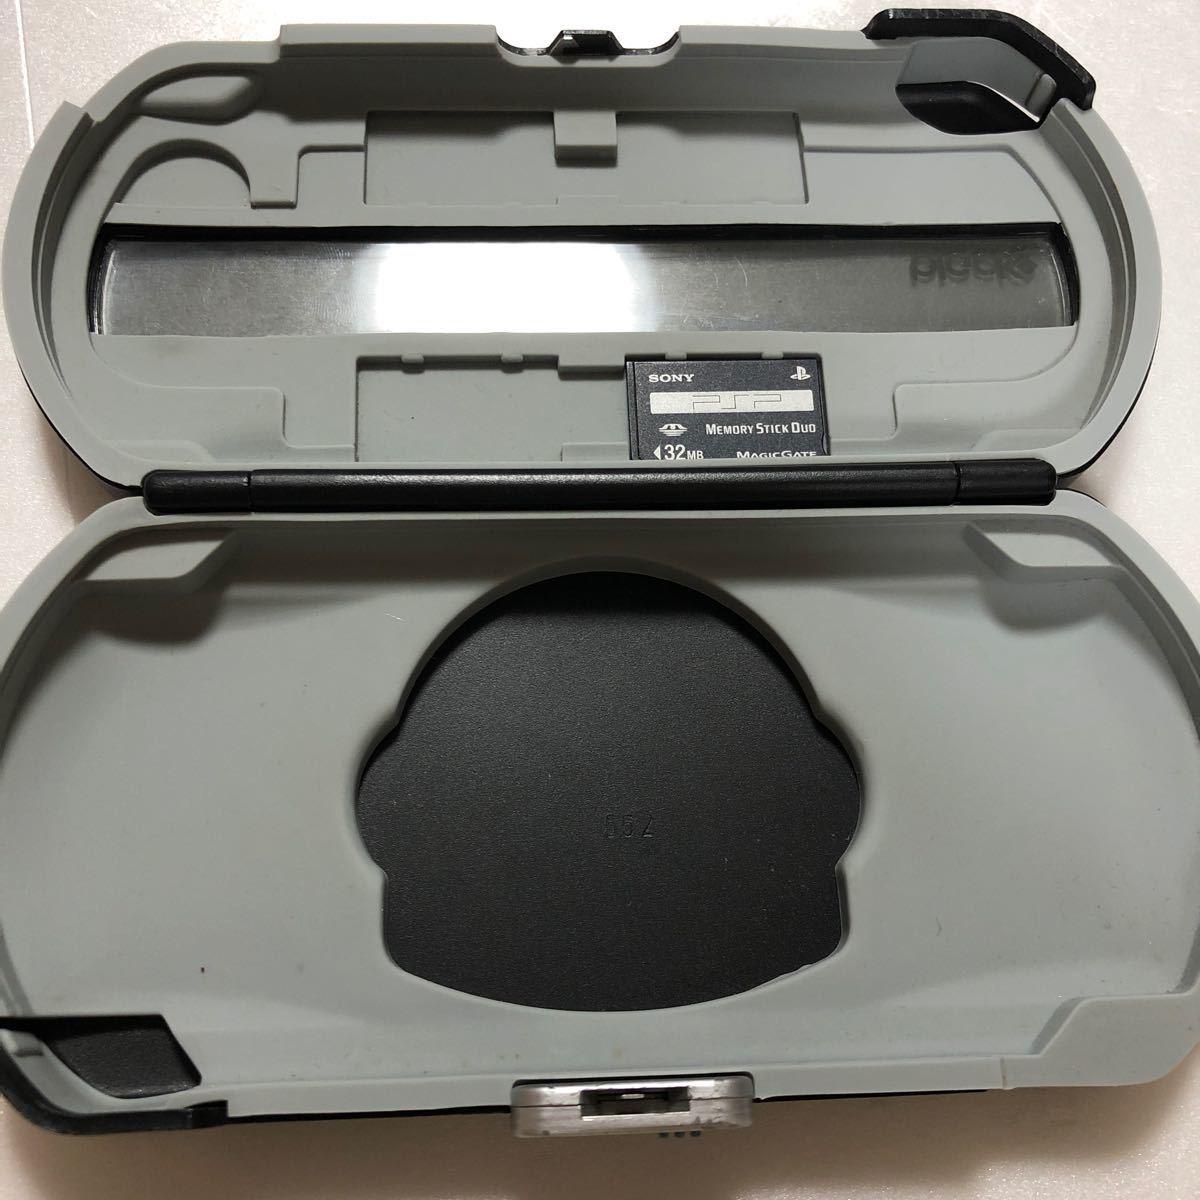 PSP専用ケースとメモリースティック(中古品)   /SONY/プレイステーションポータブル/メモリスティック/